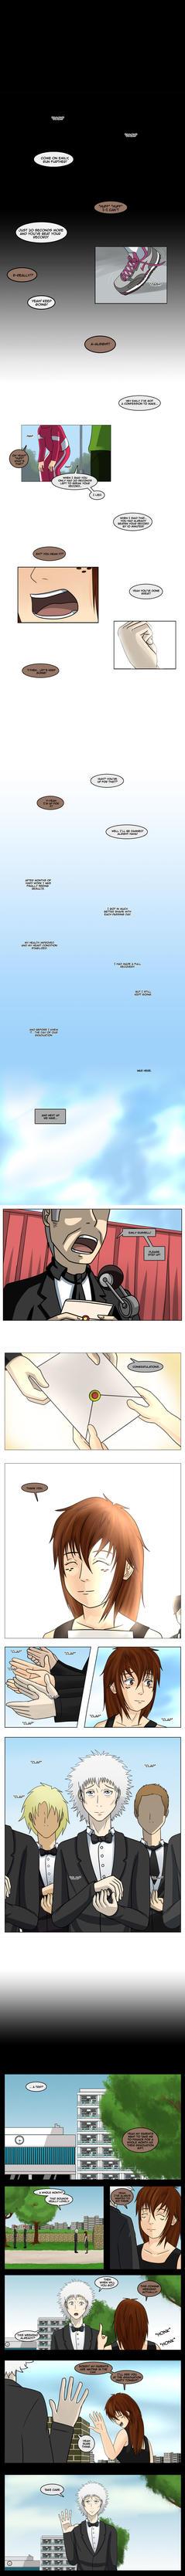 I Care - Part 8 (Webtoon Challenge) by Edowaado